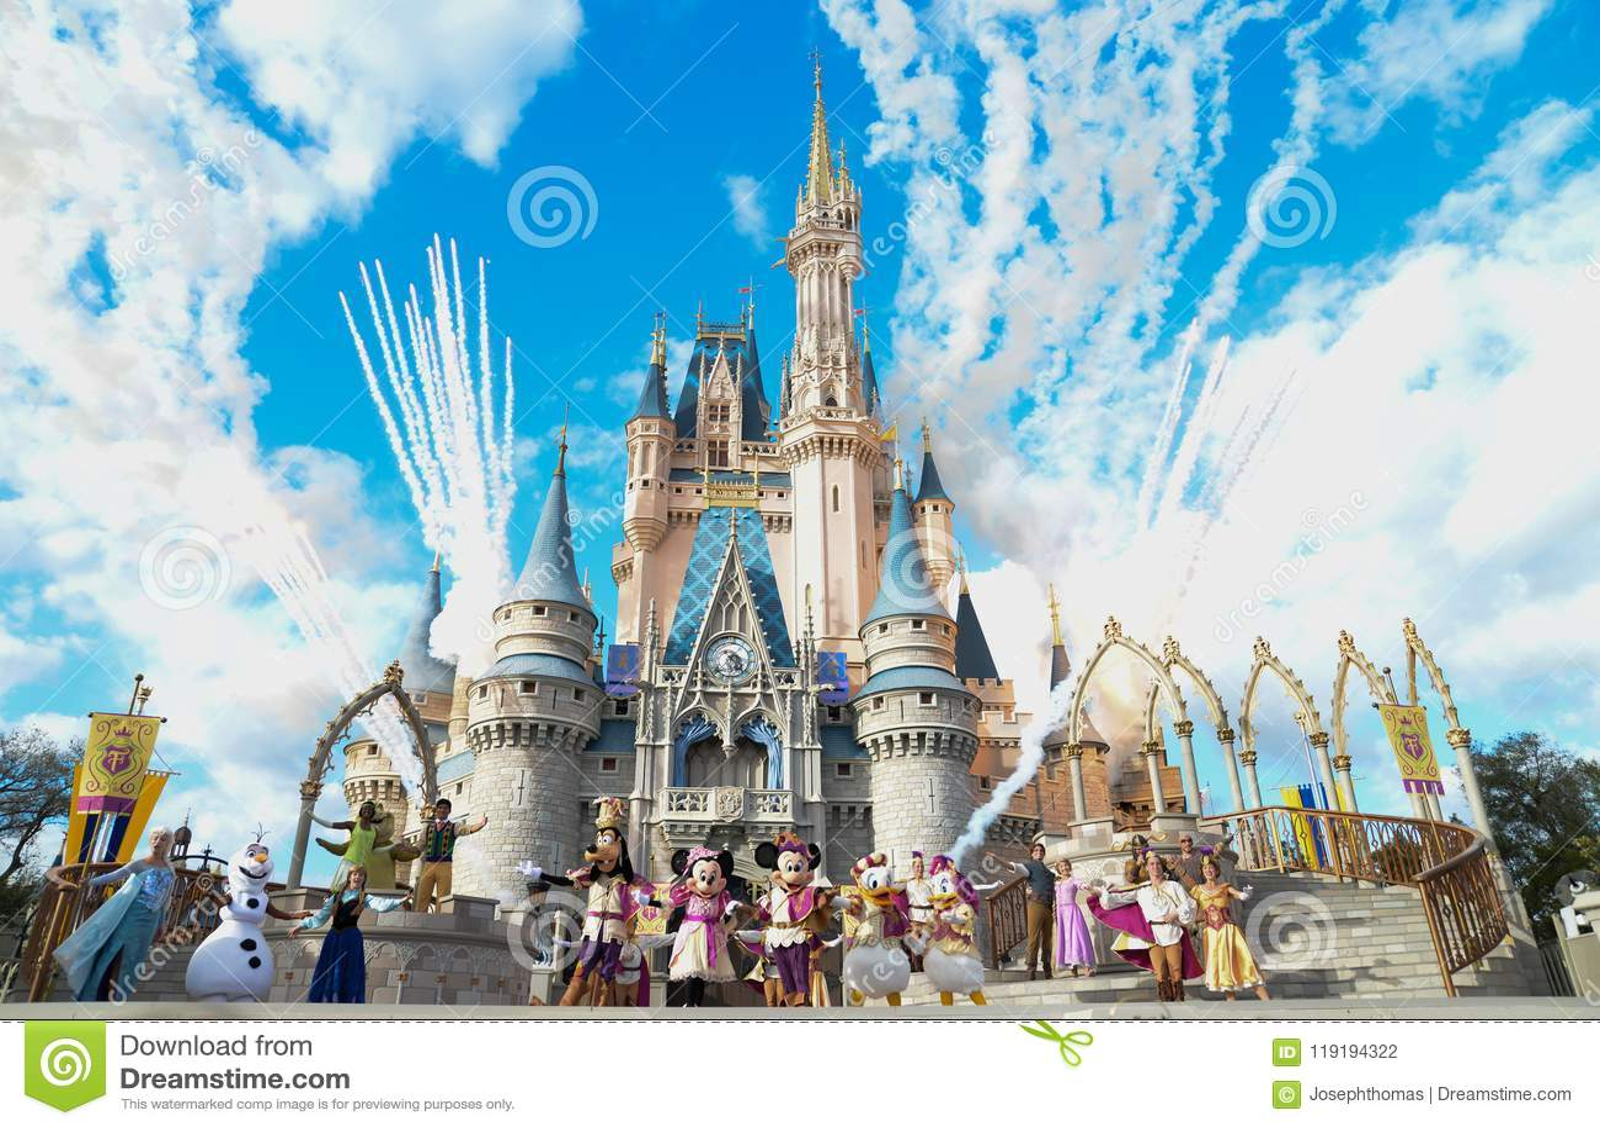 Monde de Disney Royaume magique